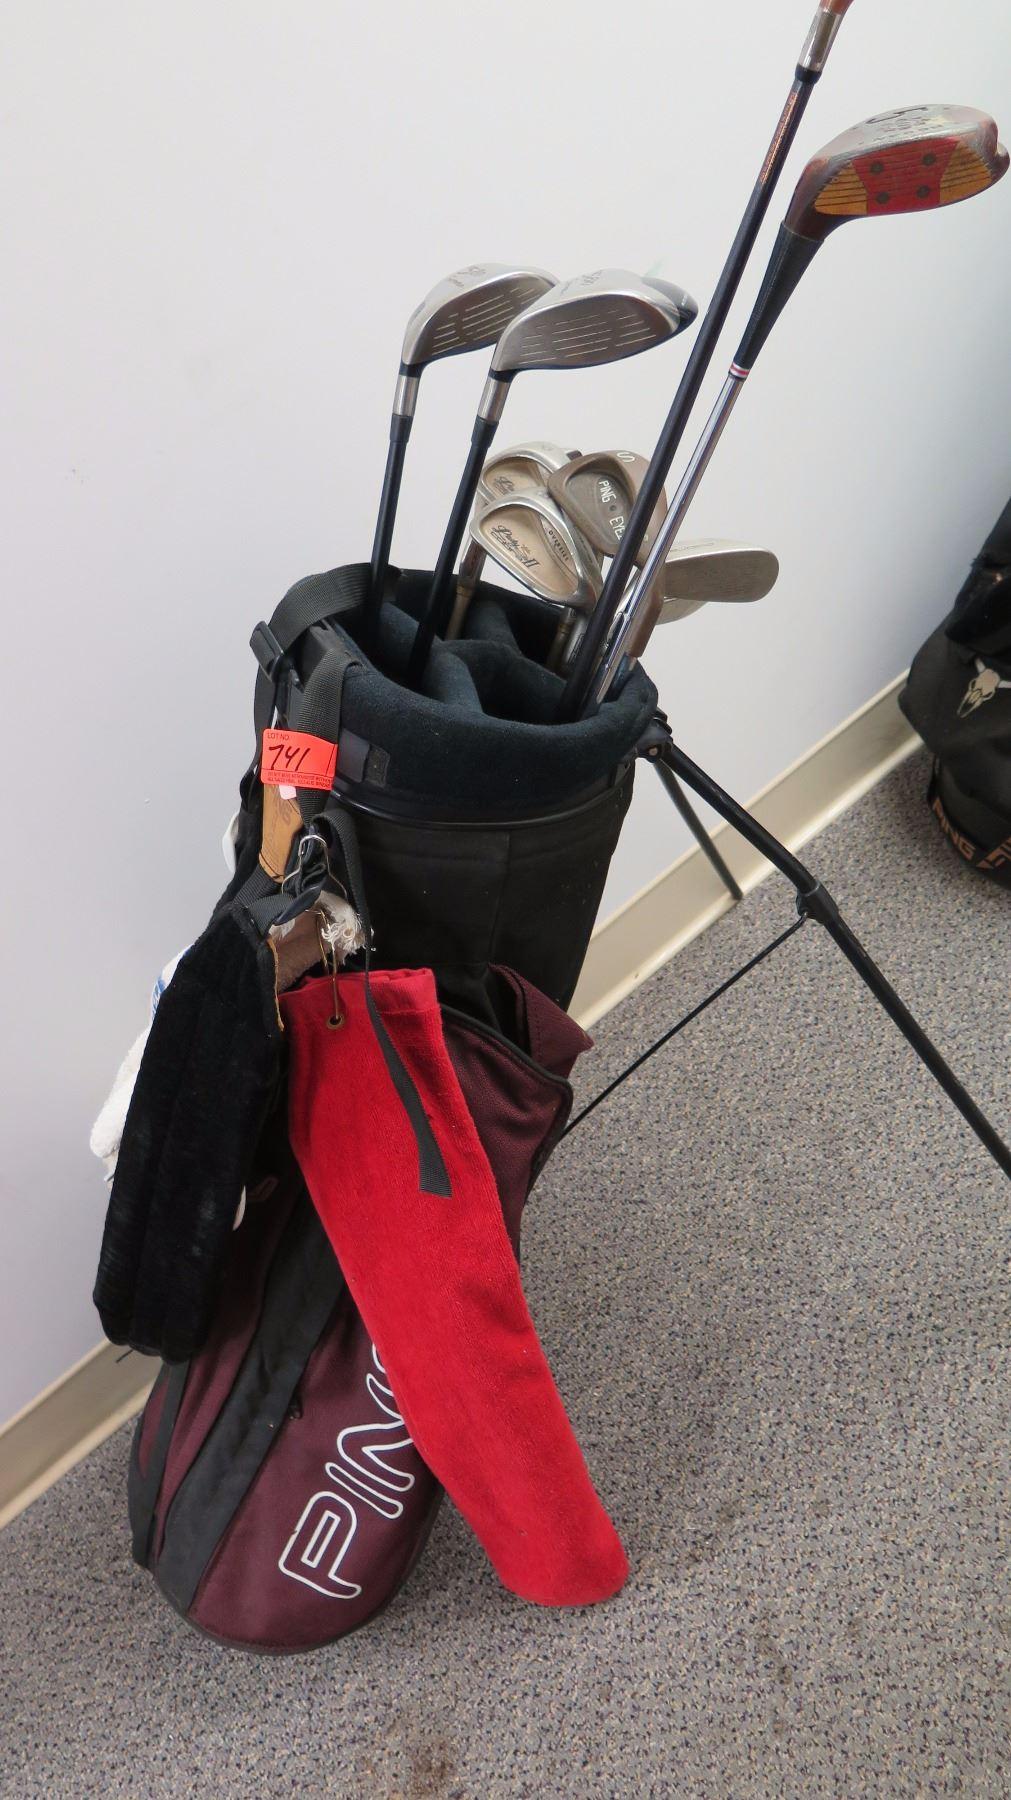 Golf Clubs & Golf Bag - Misc  Irons & Woods, (TaylorMade